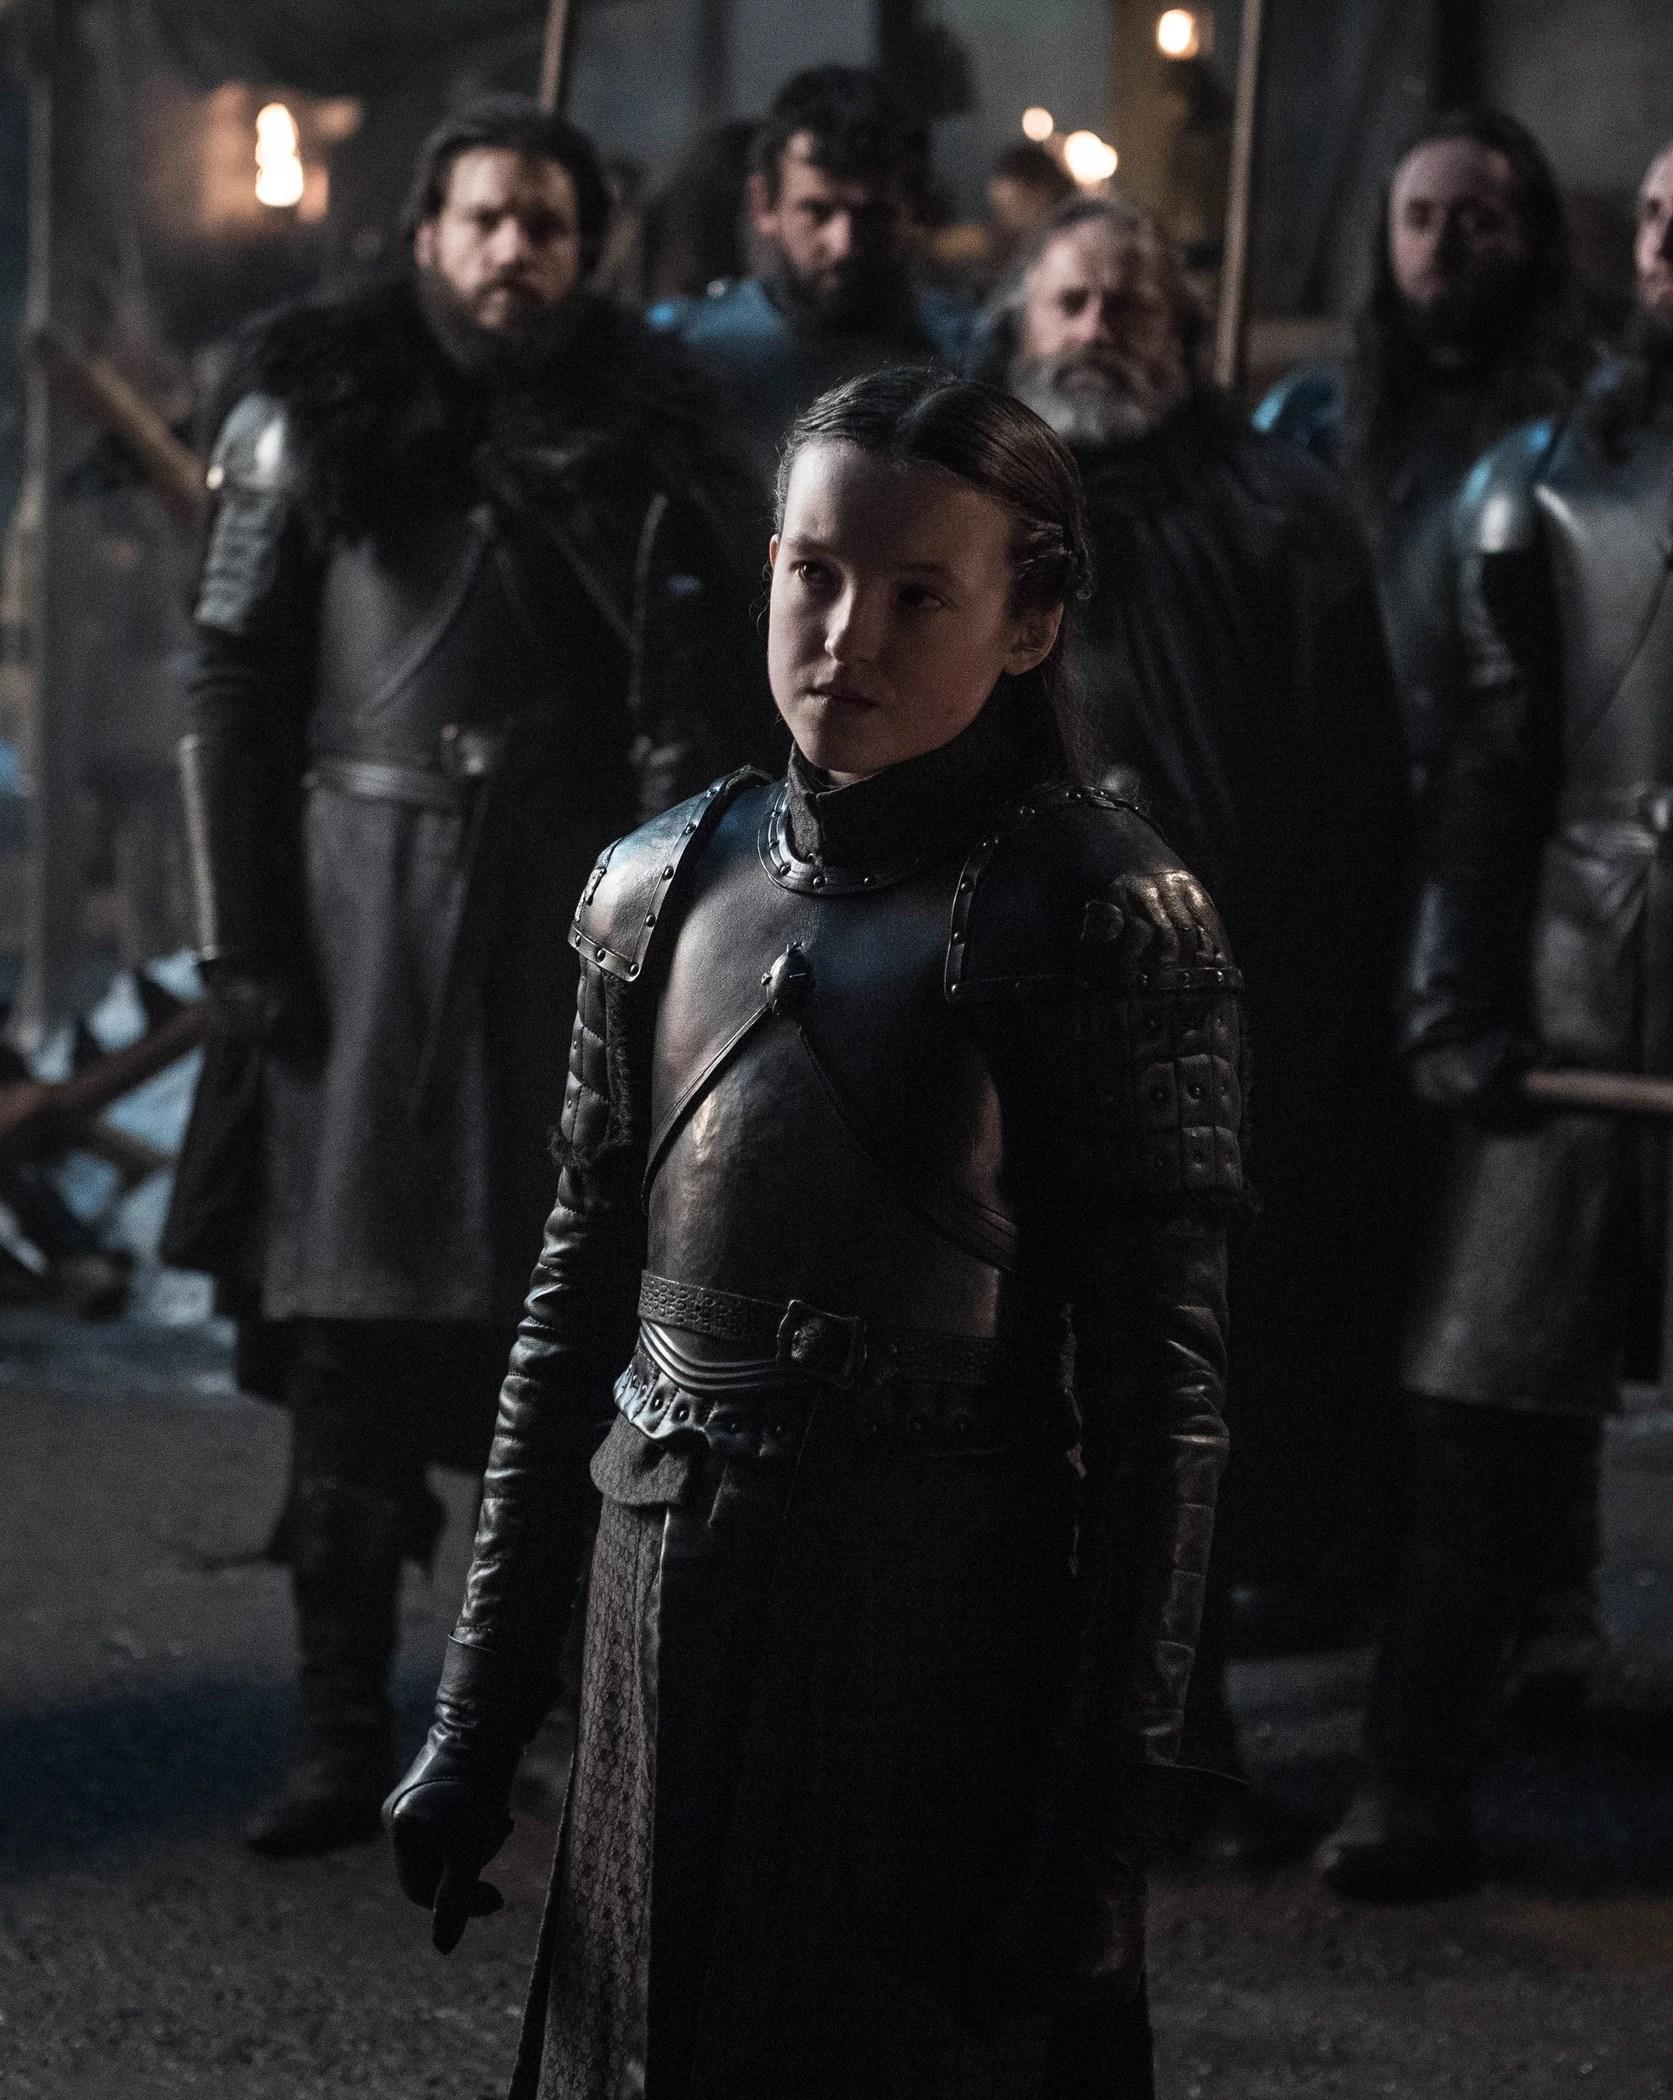 Streaming Games Of Thrones Saison 8 Episode 2 : streaming, games, thrones, saison, episode, Thrones, Season, Episode, Stream